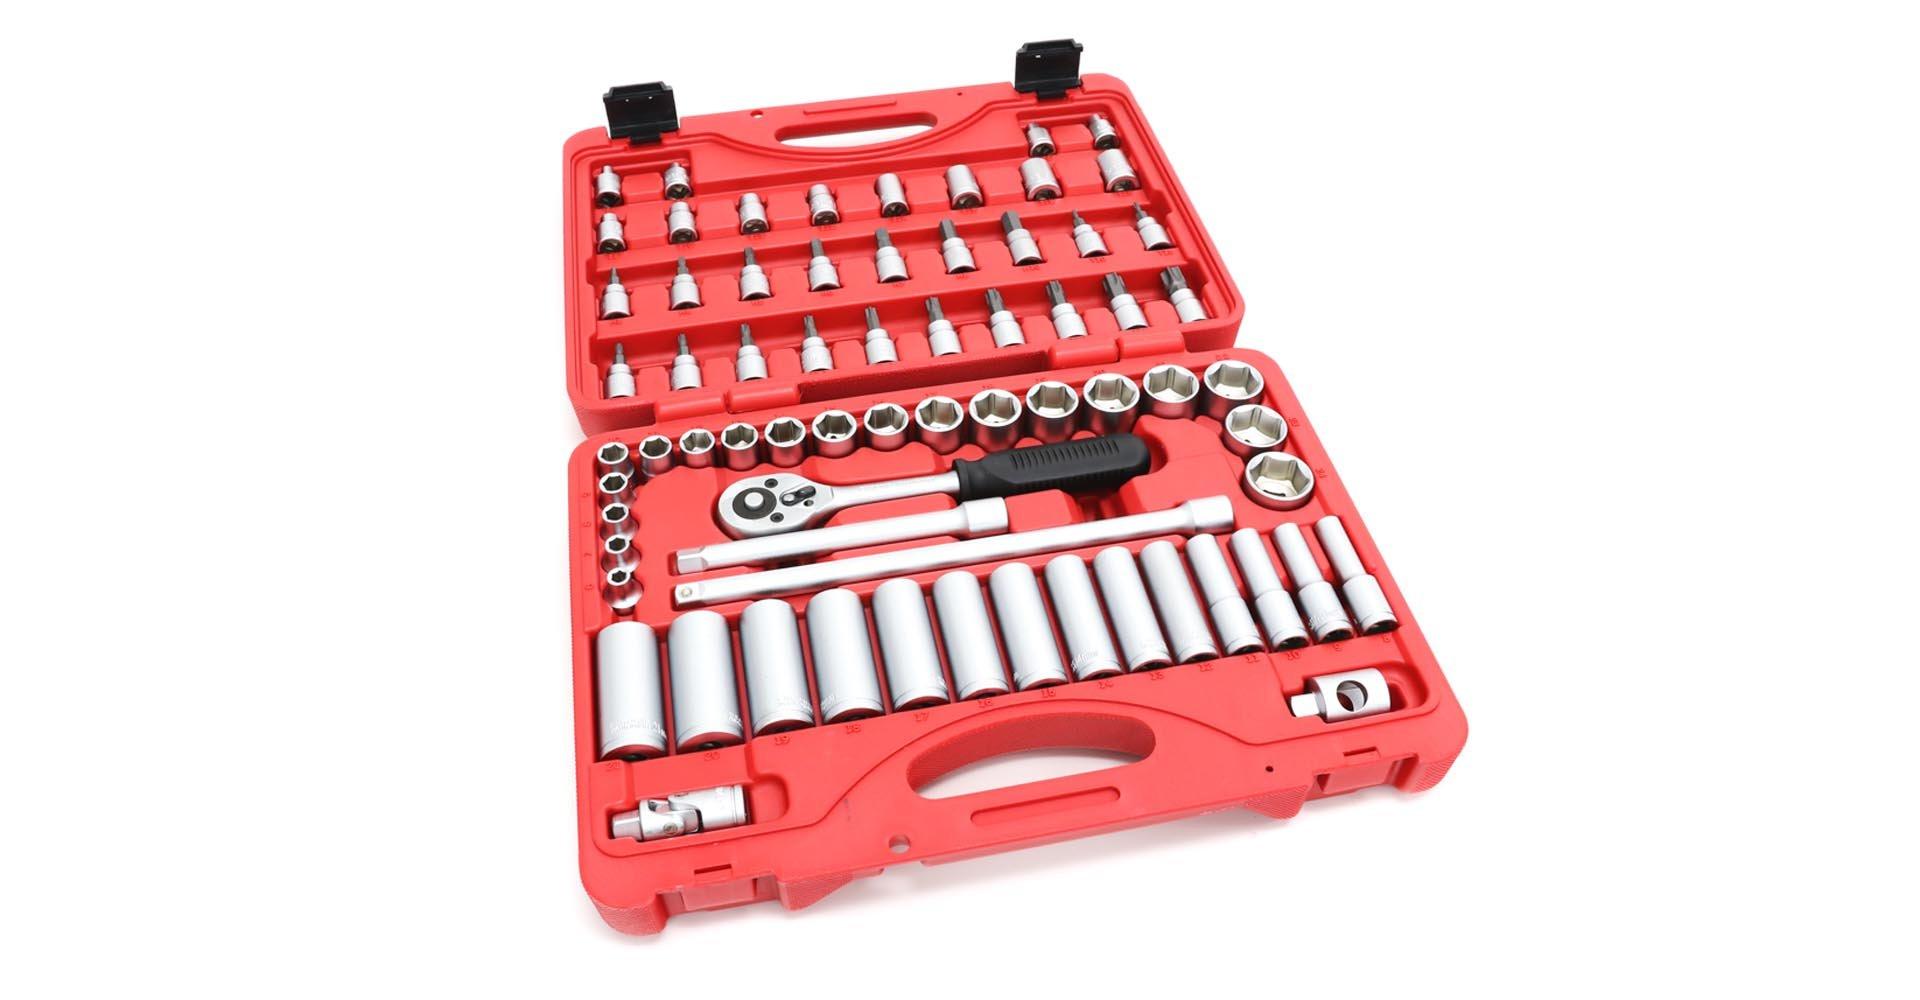 69-piece-tool-set